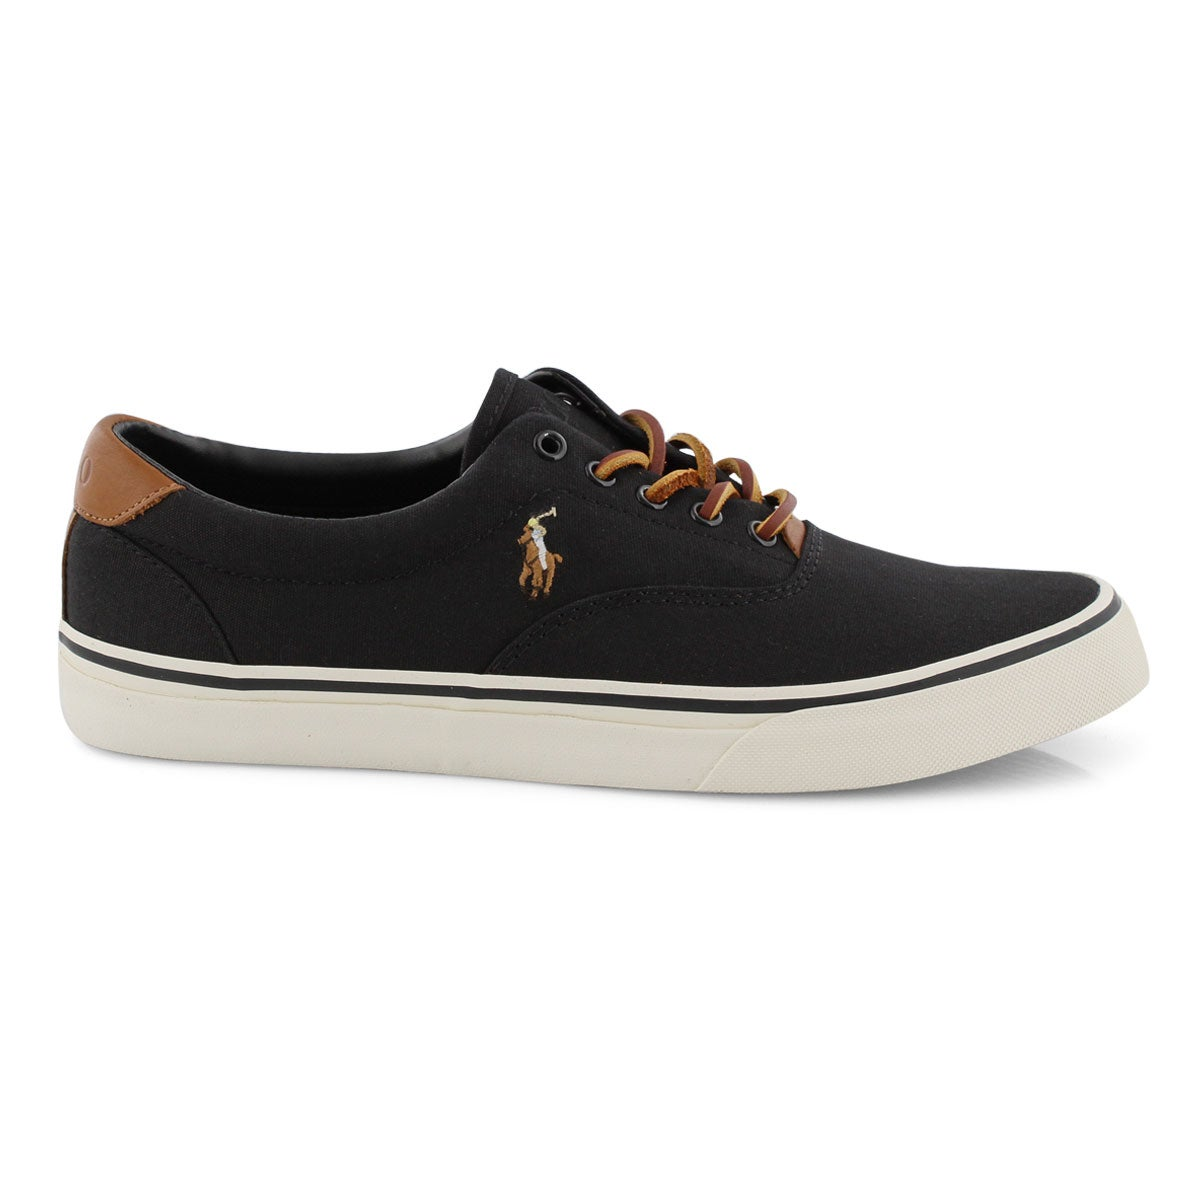 Mns Thorton black lace up sneaker